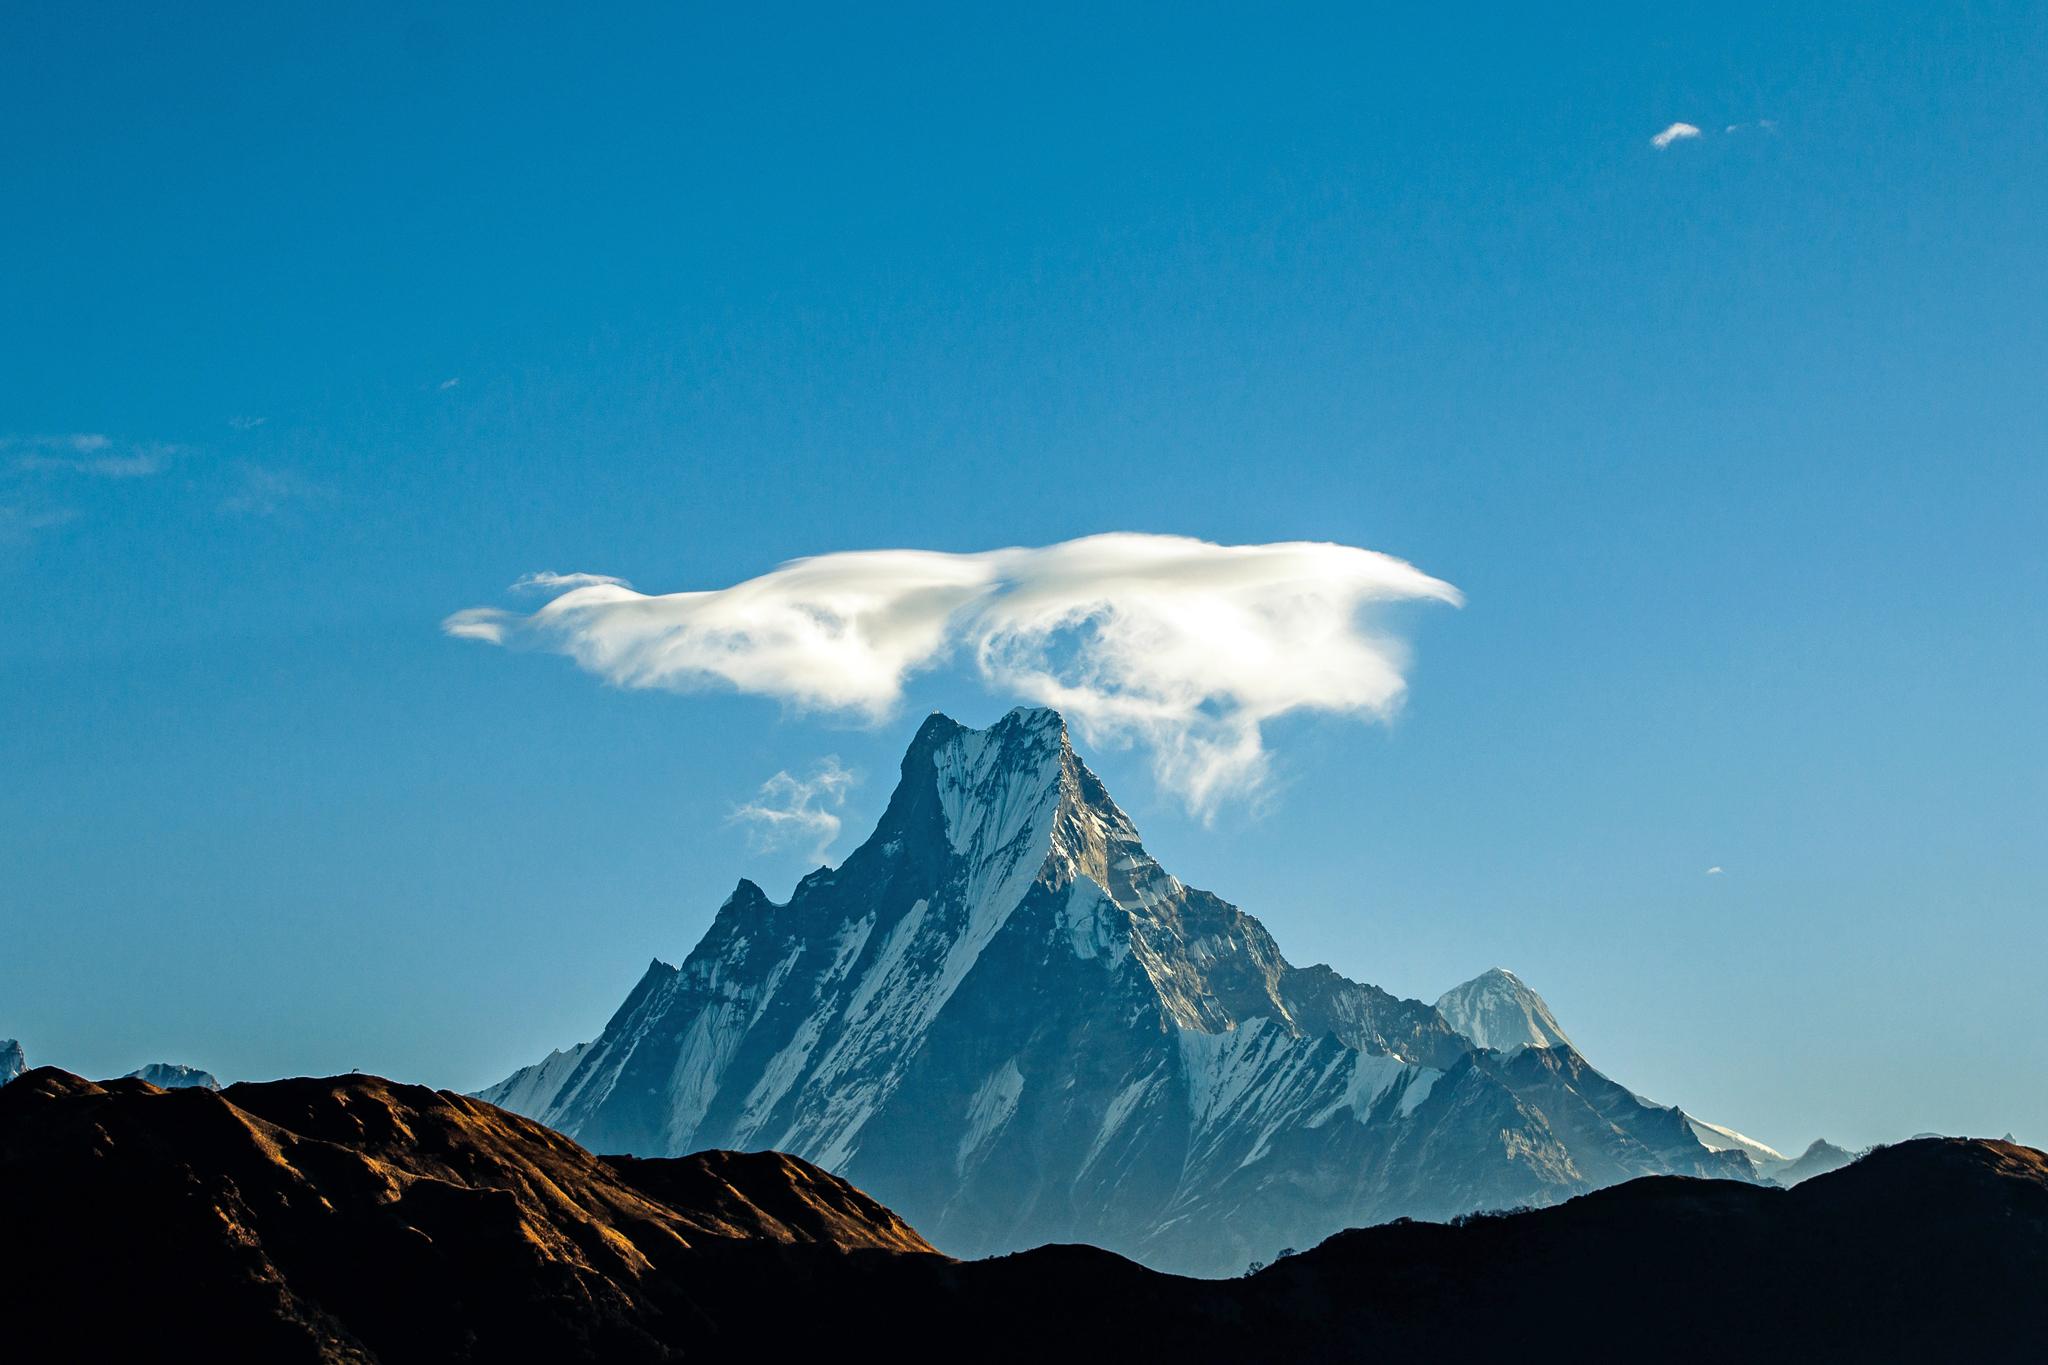 Machapuchare, heiliger Berg im Annapurna-Massiv © www.pxhere.com